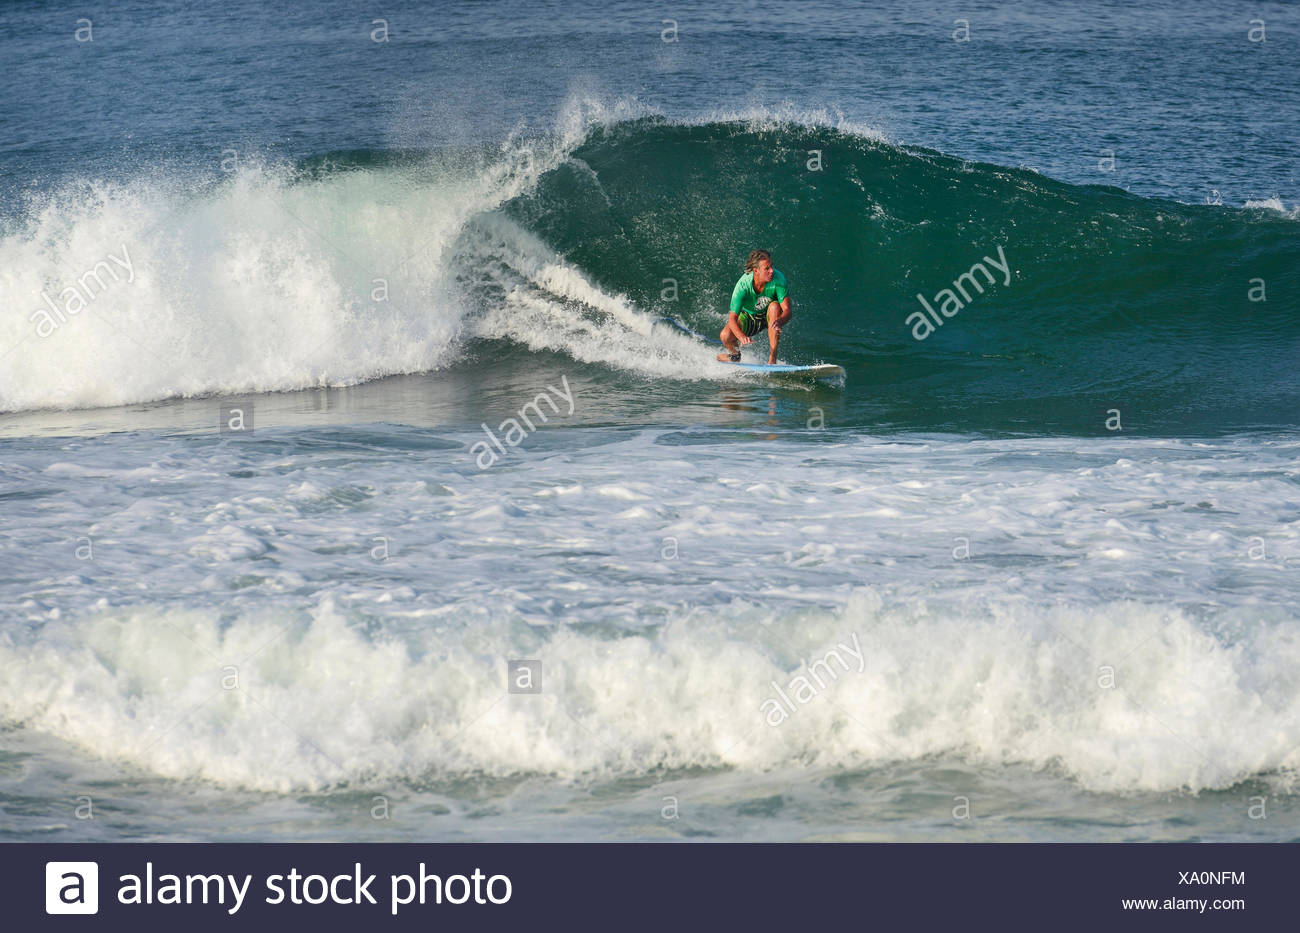 Surfer une vague, France, Landes, Hossegor Photo Stock